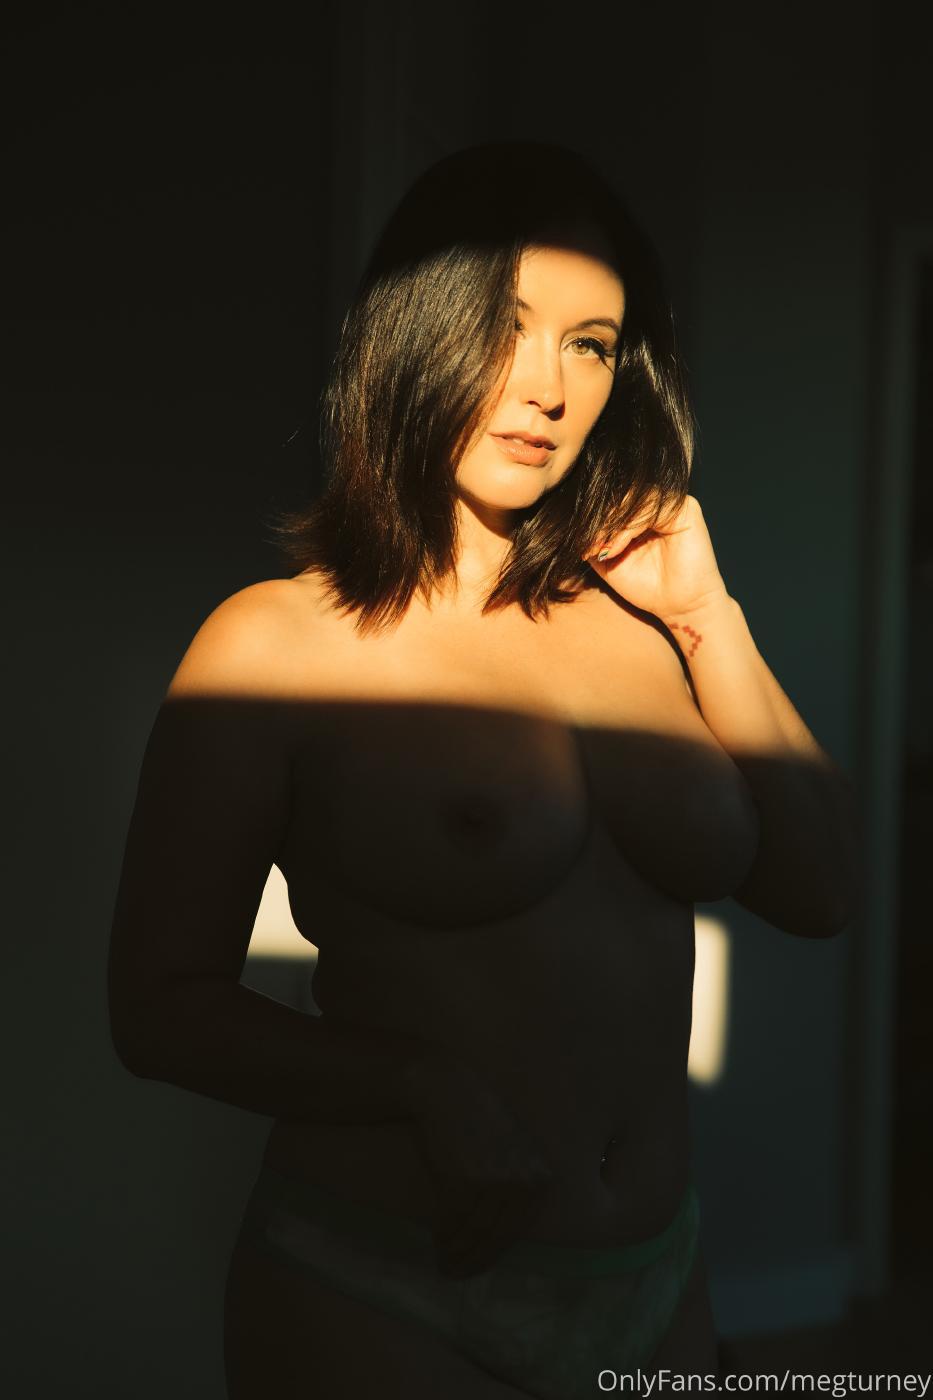 Meg Turney Nude Sunset Onlyfans Set Leaked Nshsyr